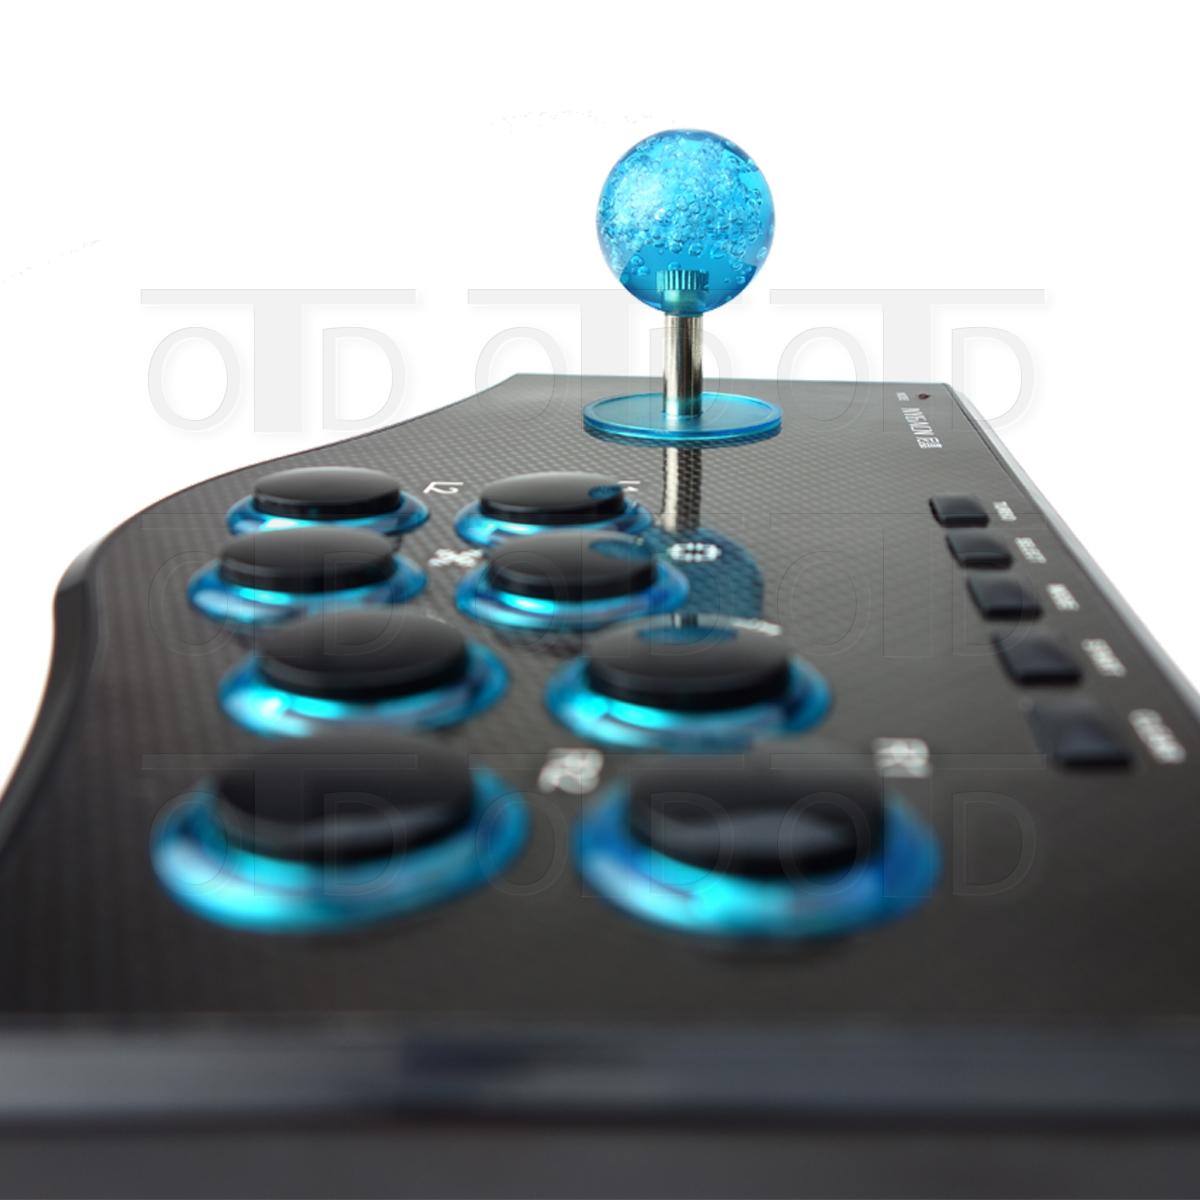 OTD Pro Arcade USB Controller - Raspberry Pi - RetroPie RetroPi Compatible